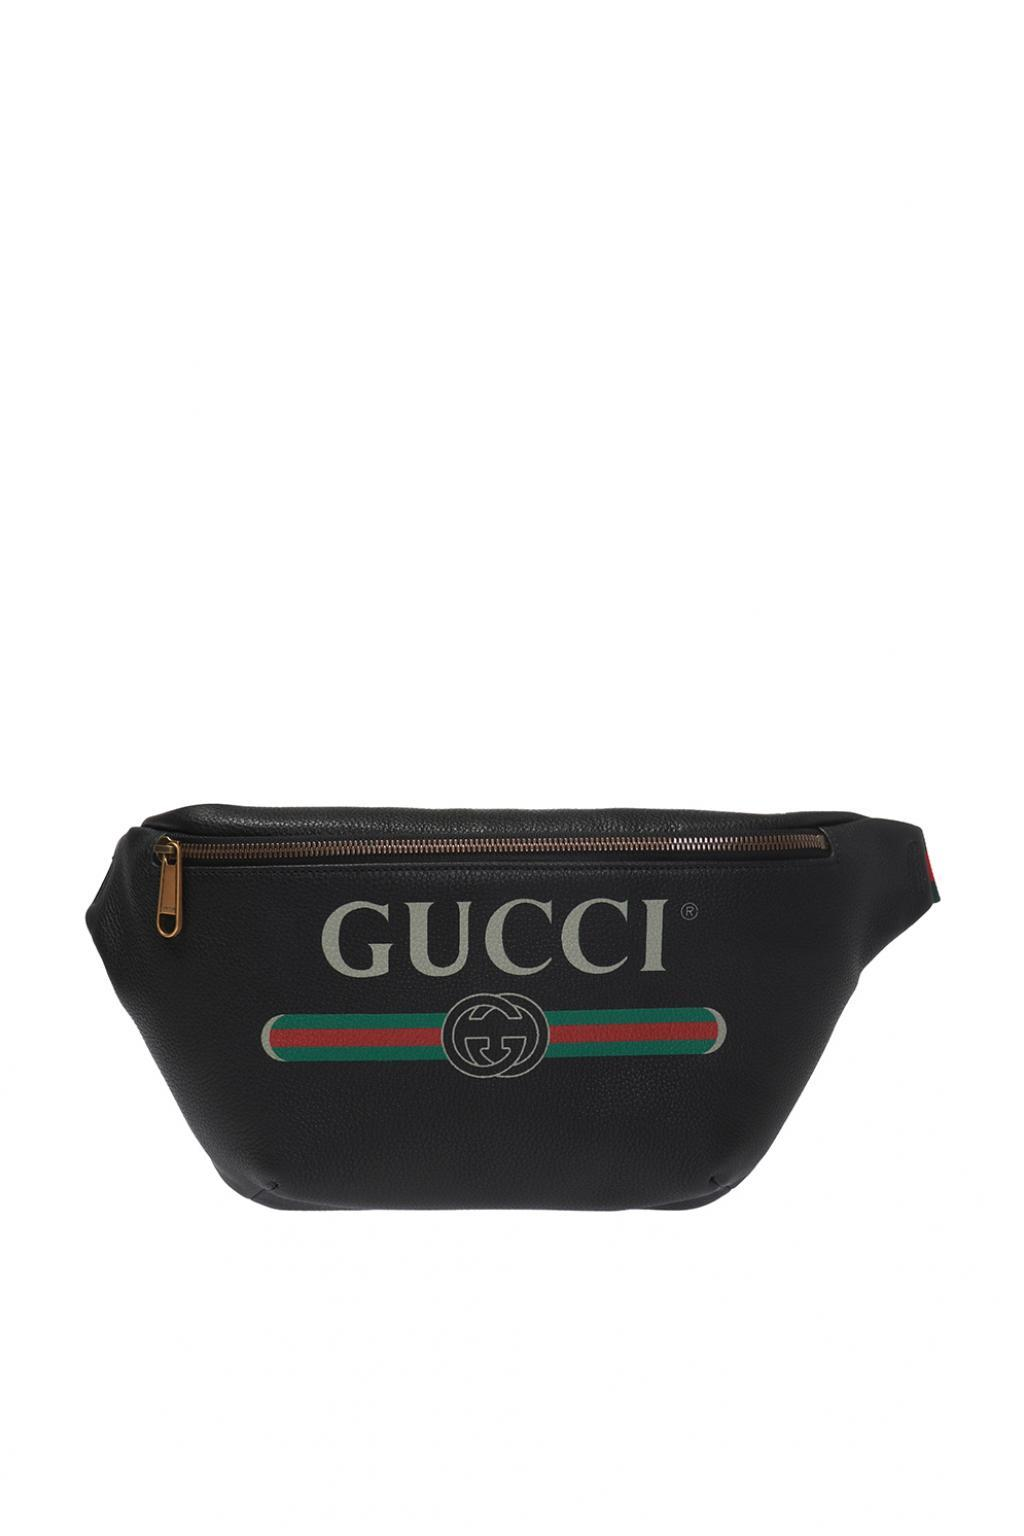 337683783bdb2 Gucci - Black  web  Stripe Belt Bag for Men - Lyst. View fullscreen